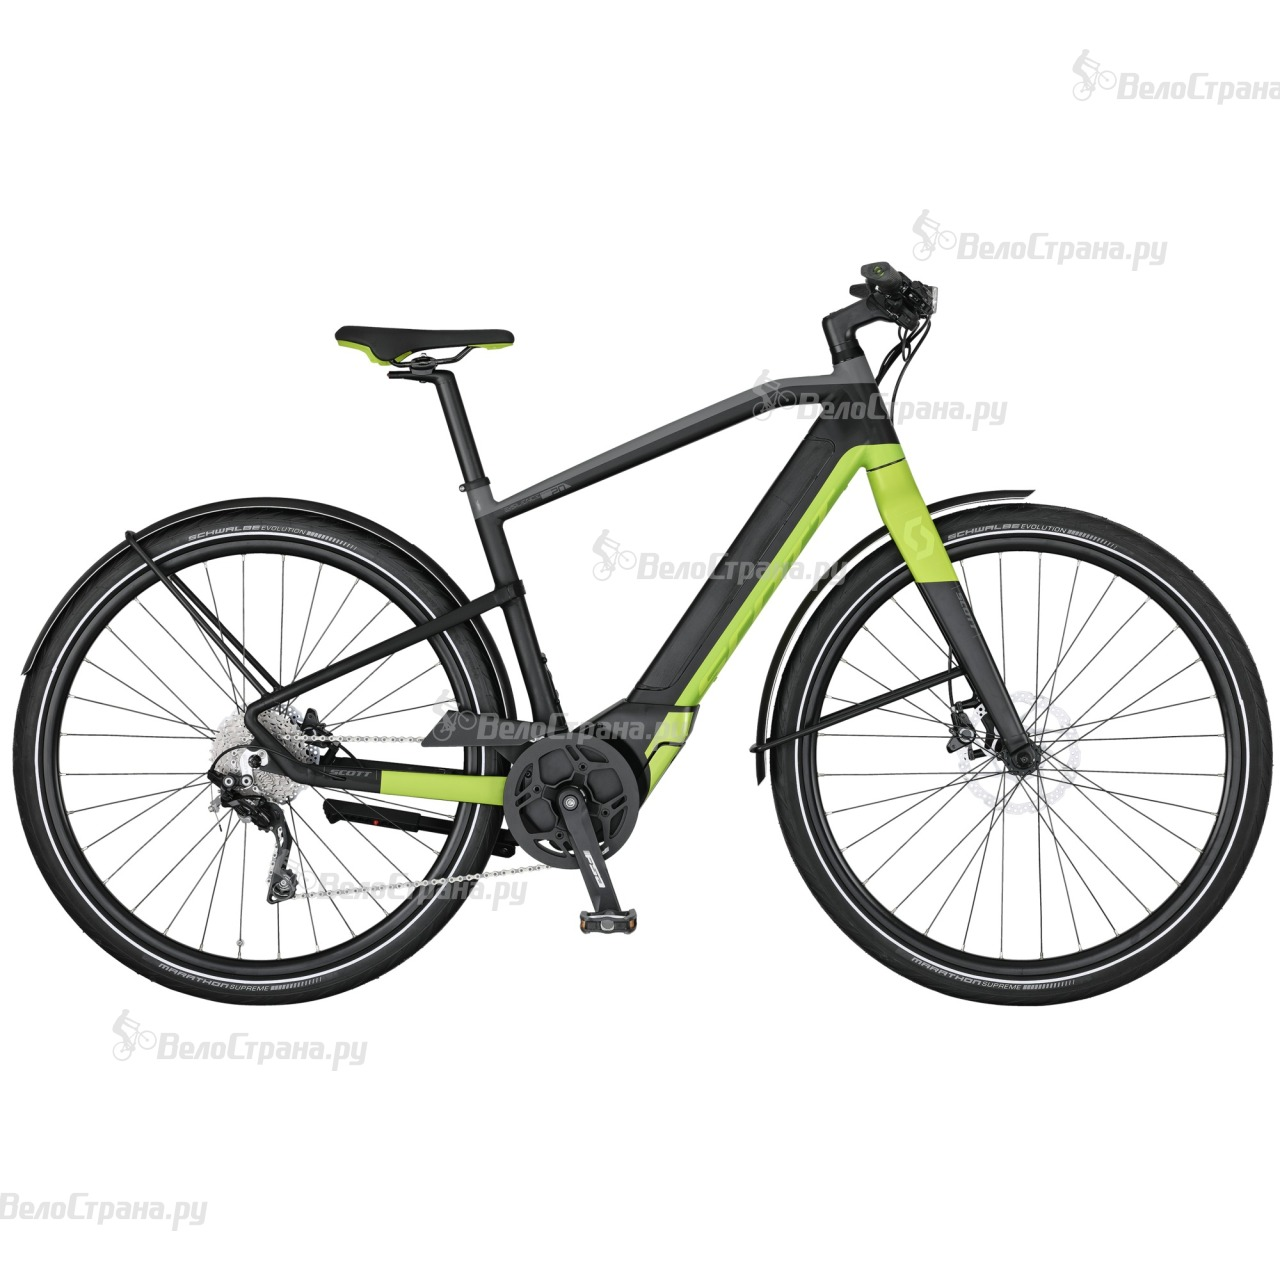 Велосипед Scott E-Silence Speed 10 (2017) велосипед scott e silence evo 2017